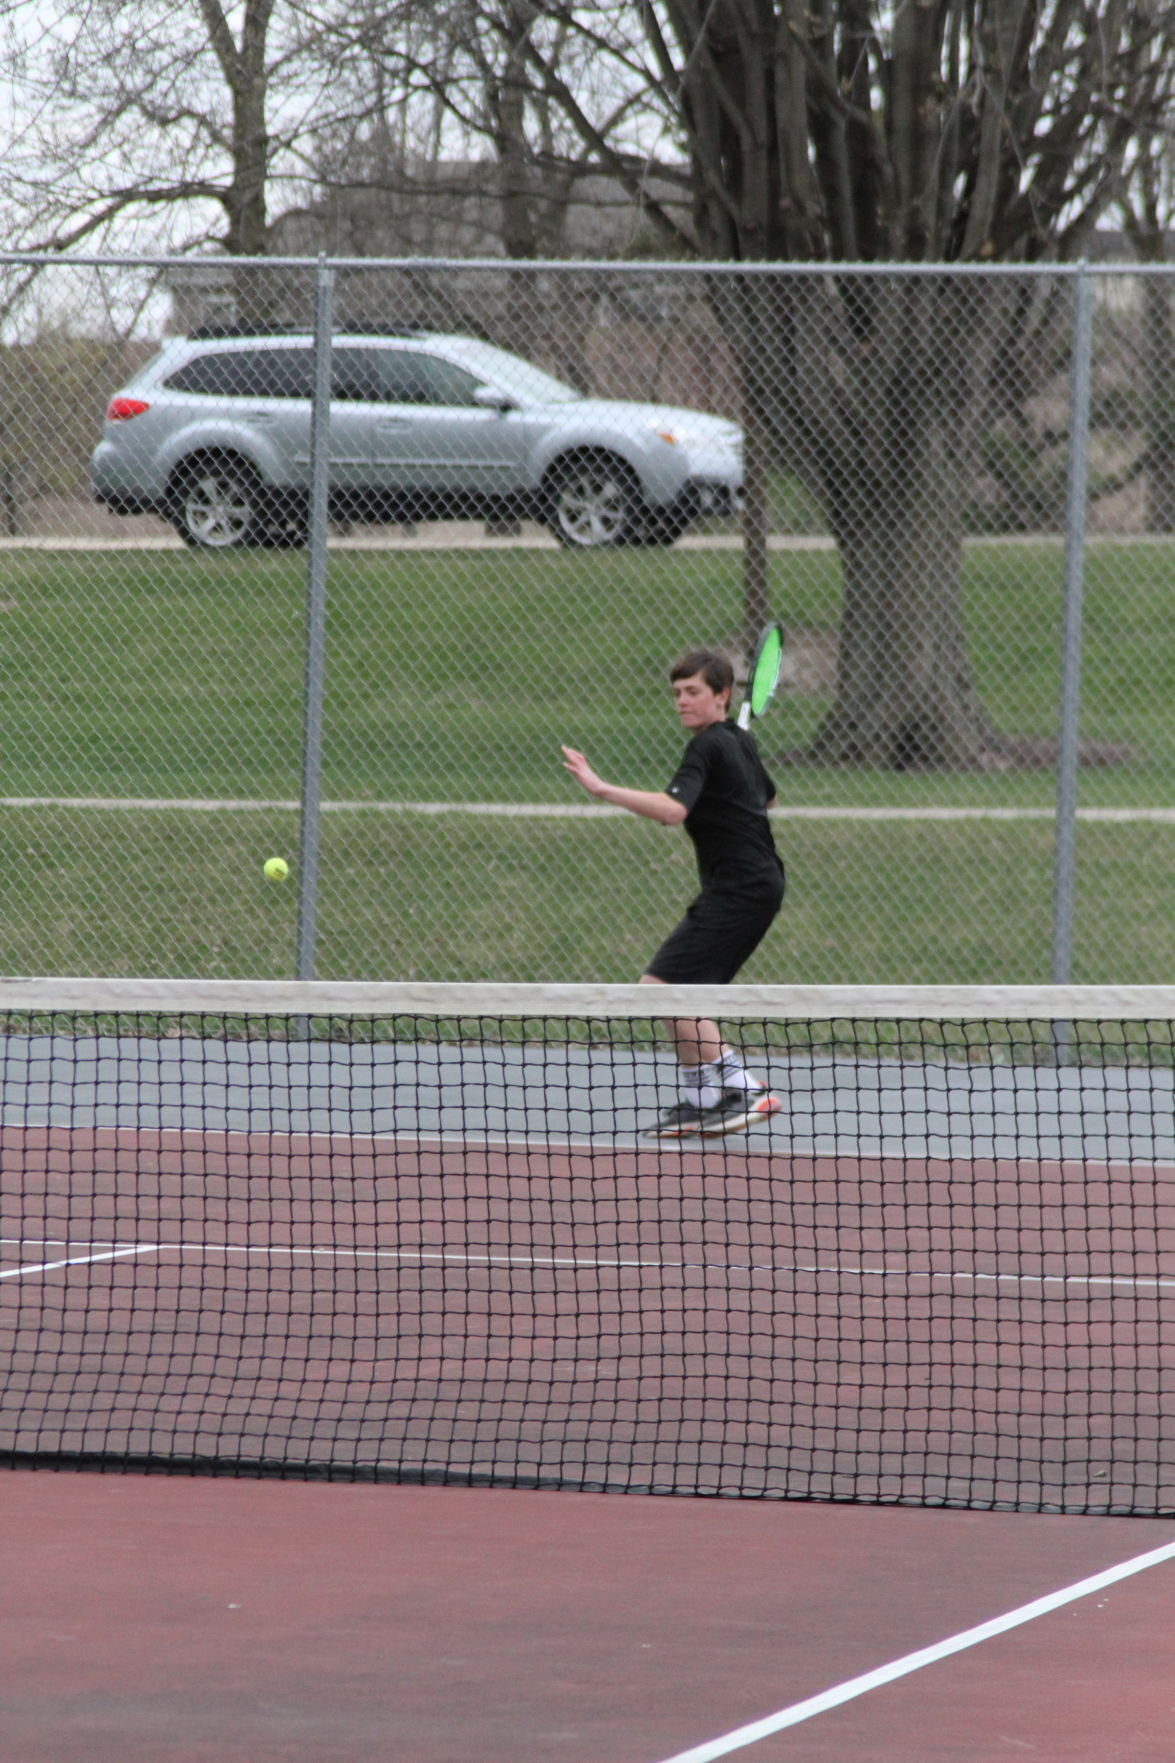 dcx-04212021-spt-wd-boys-tennis-IMG_7285.JPG